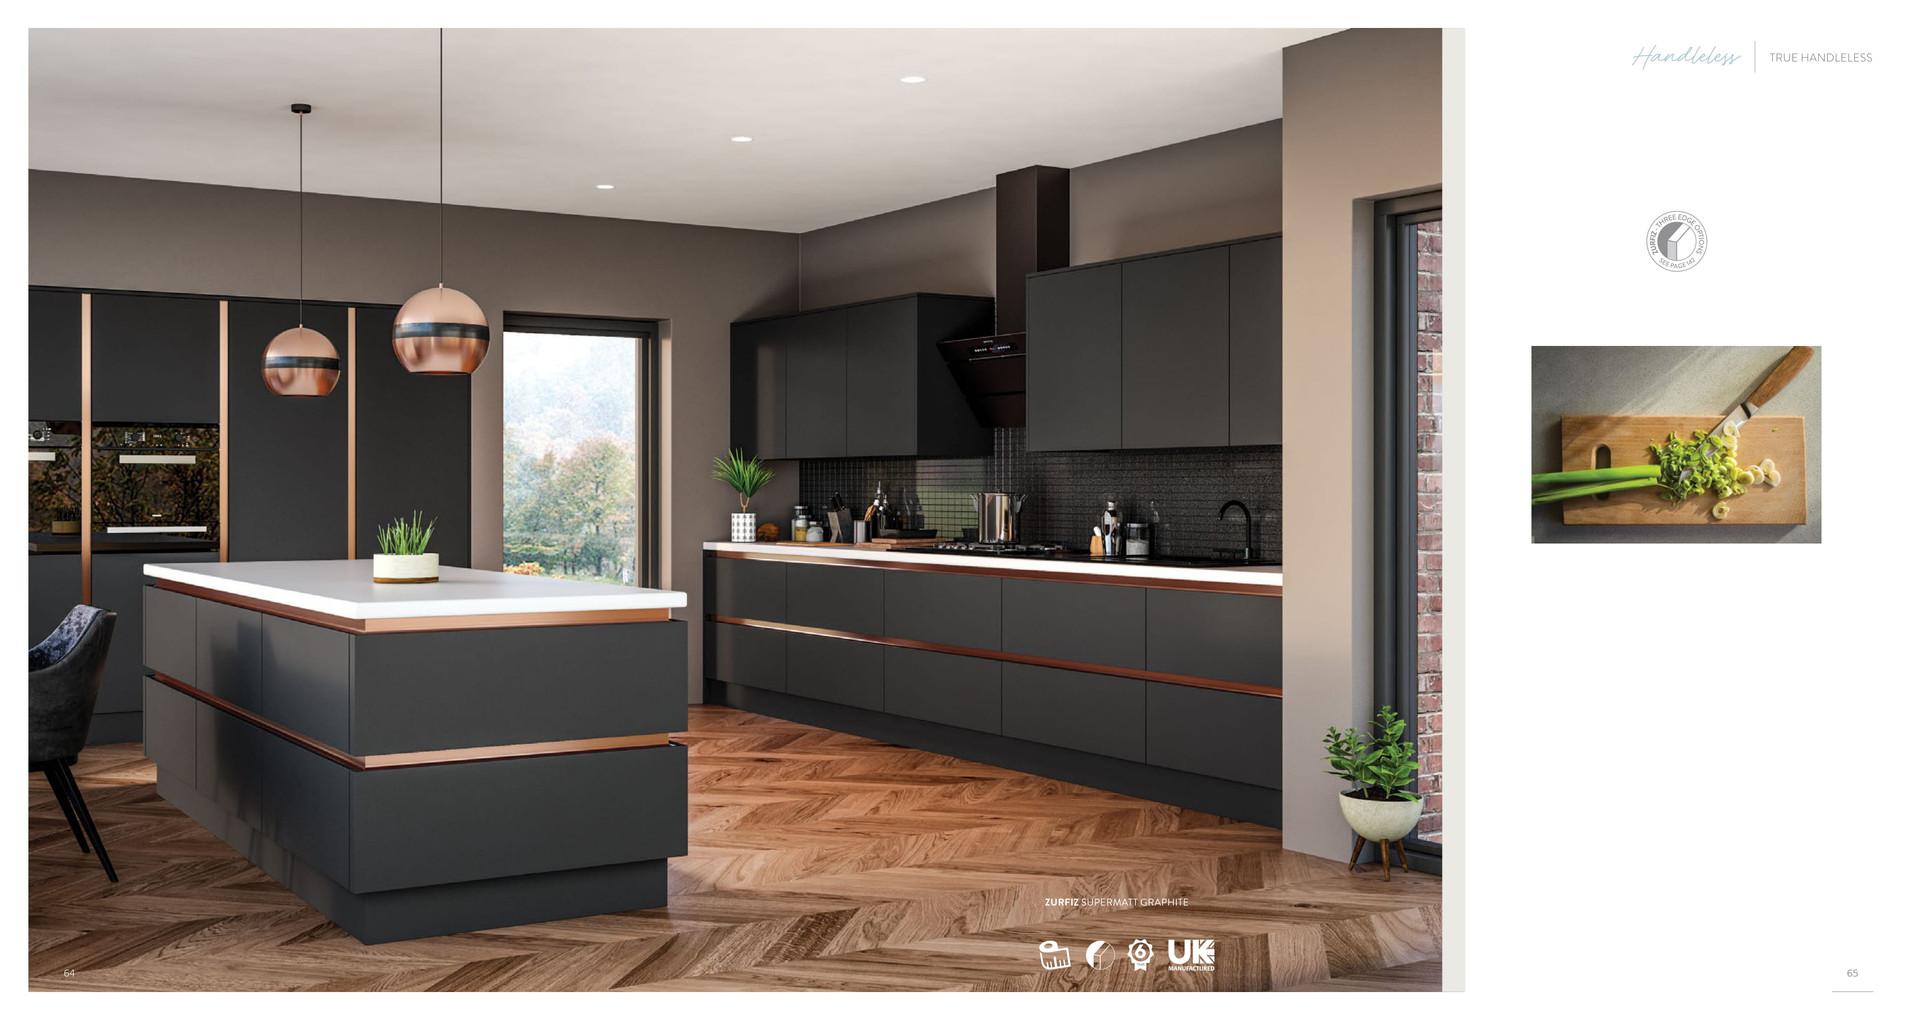 blossom-avenue-kitchen-brochure-2020-33.